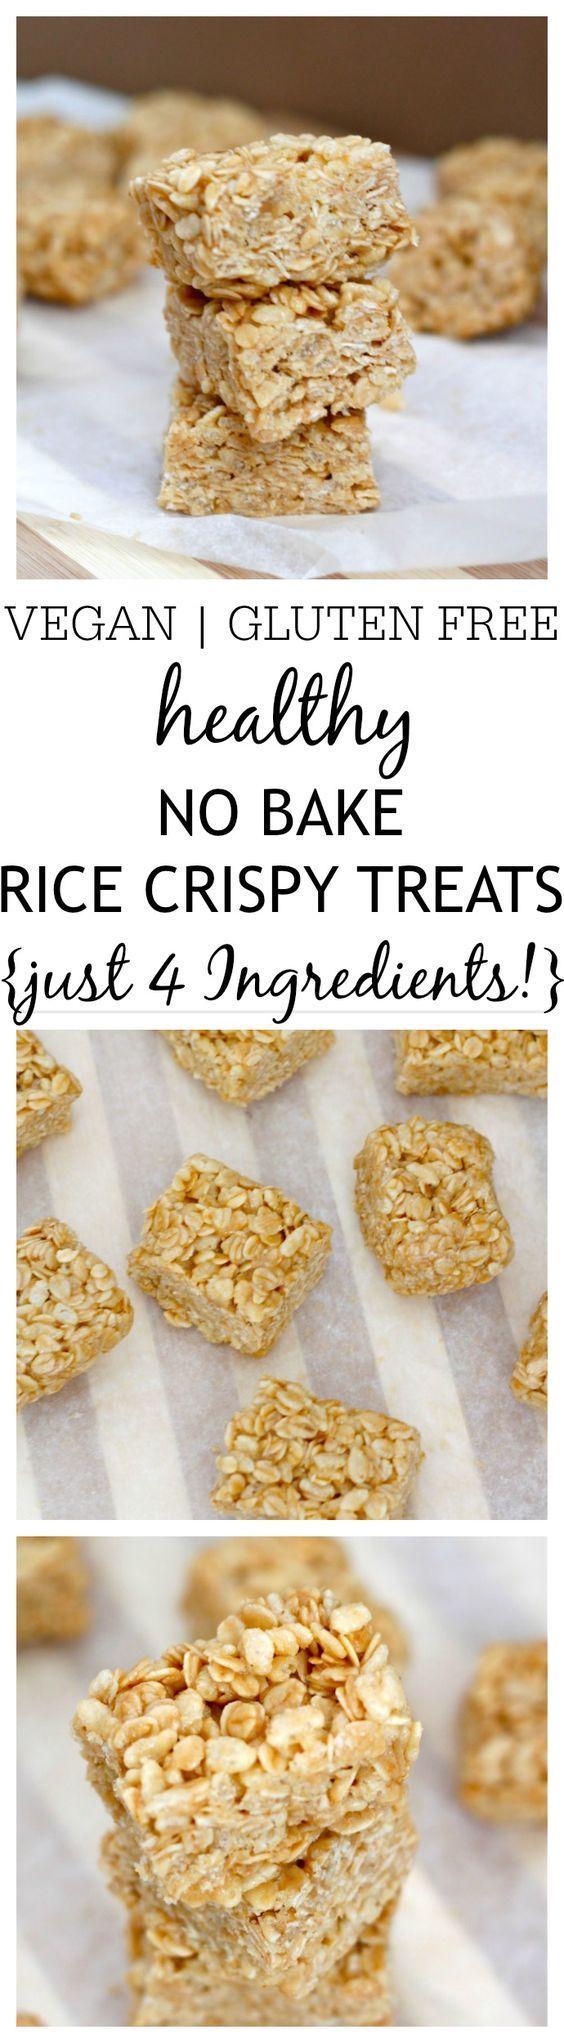 ... Rice Crispy Treats! Vegan, gluten free, refined sugar free and dairy